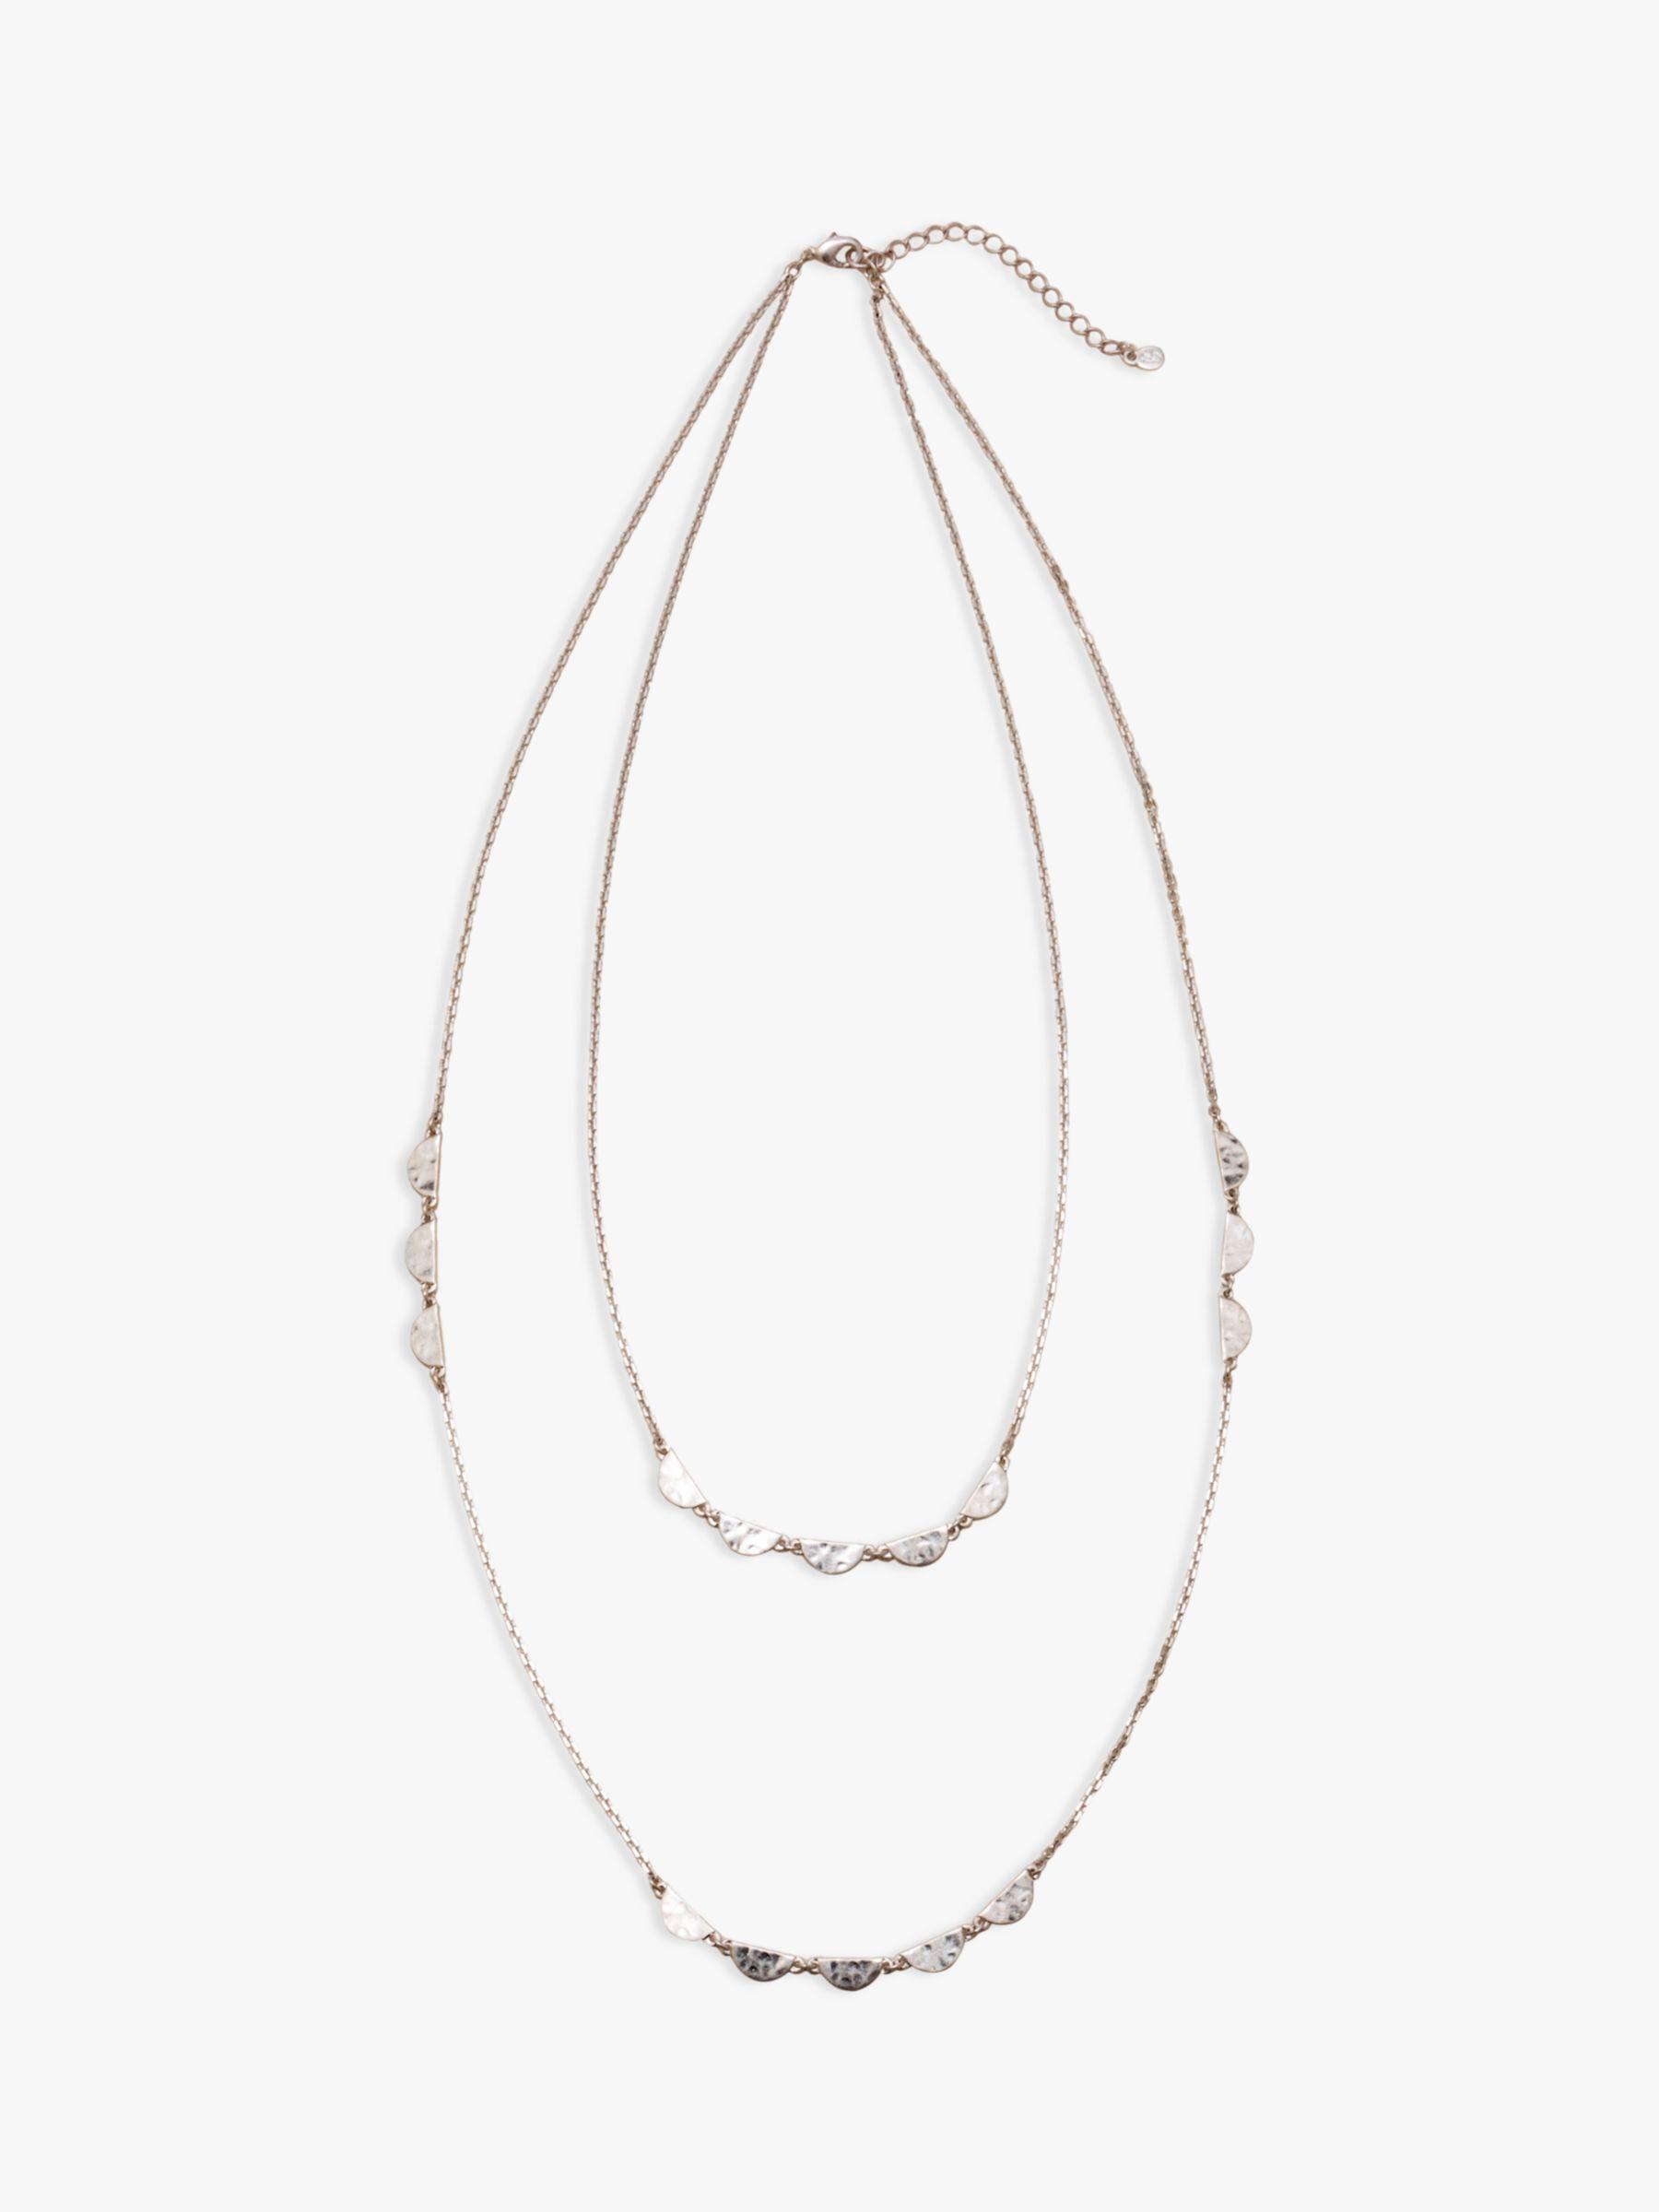 Boden Boden Scallop Longline Necklace